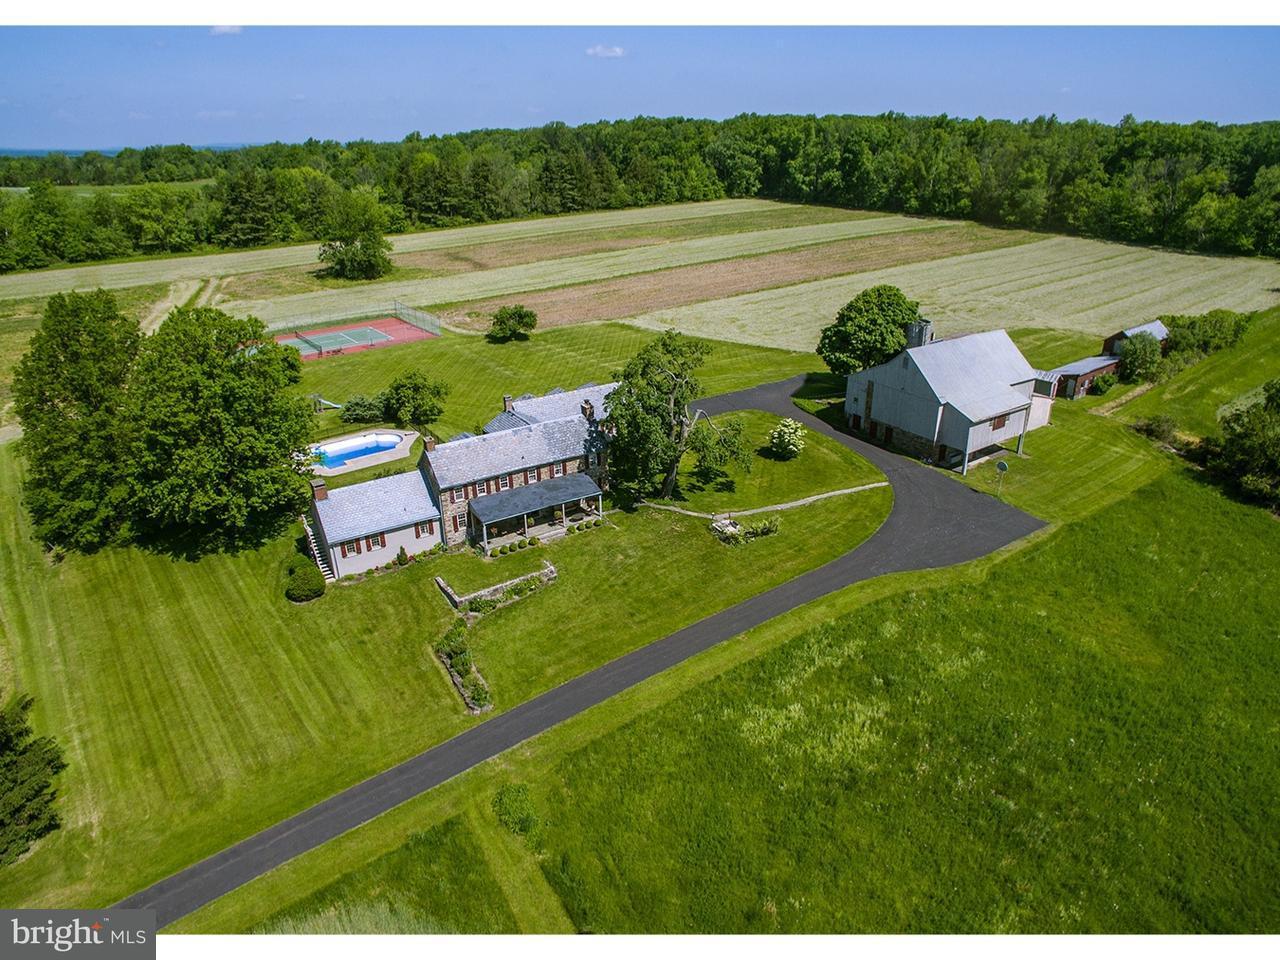 Single Family Home for Sale at 5839 WORTHINGTON Road Doylestown, Pennsylvania 18901 United States